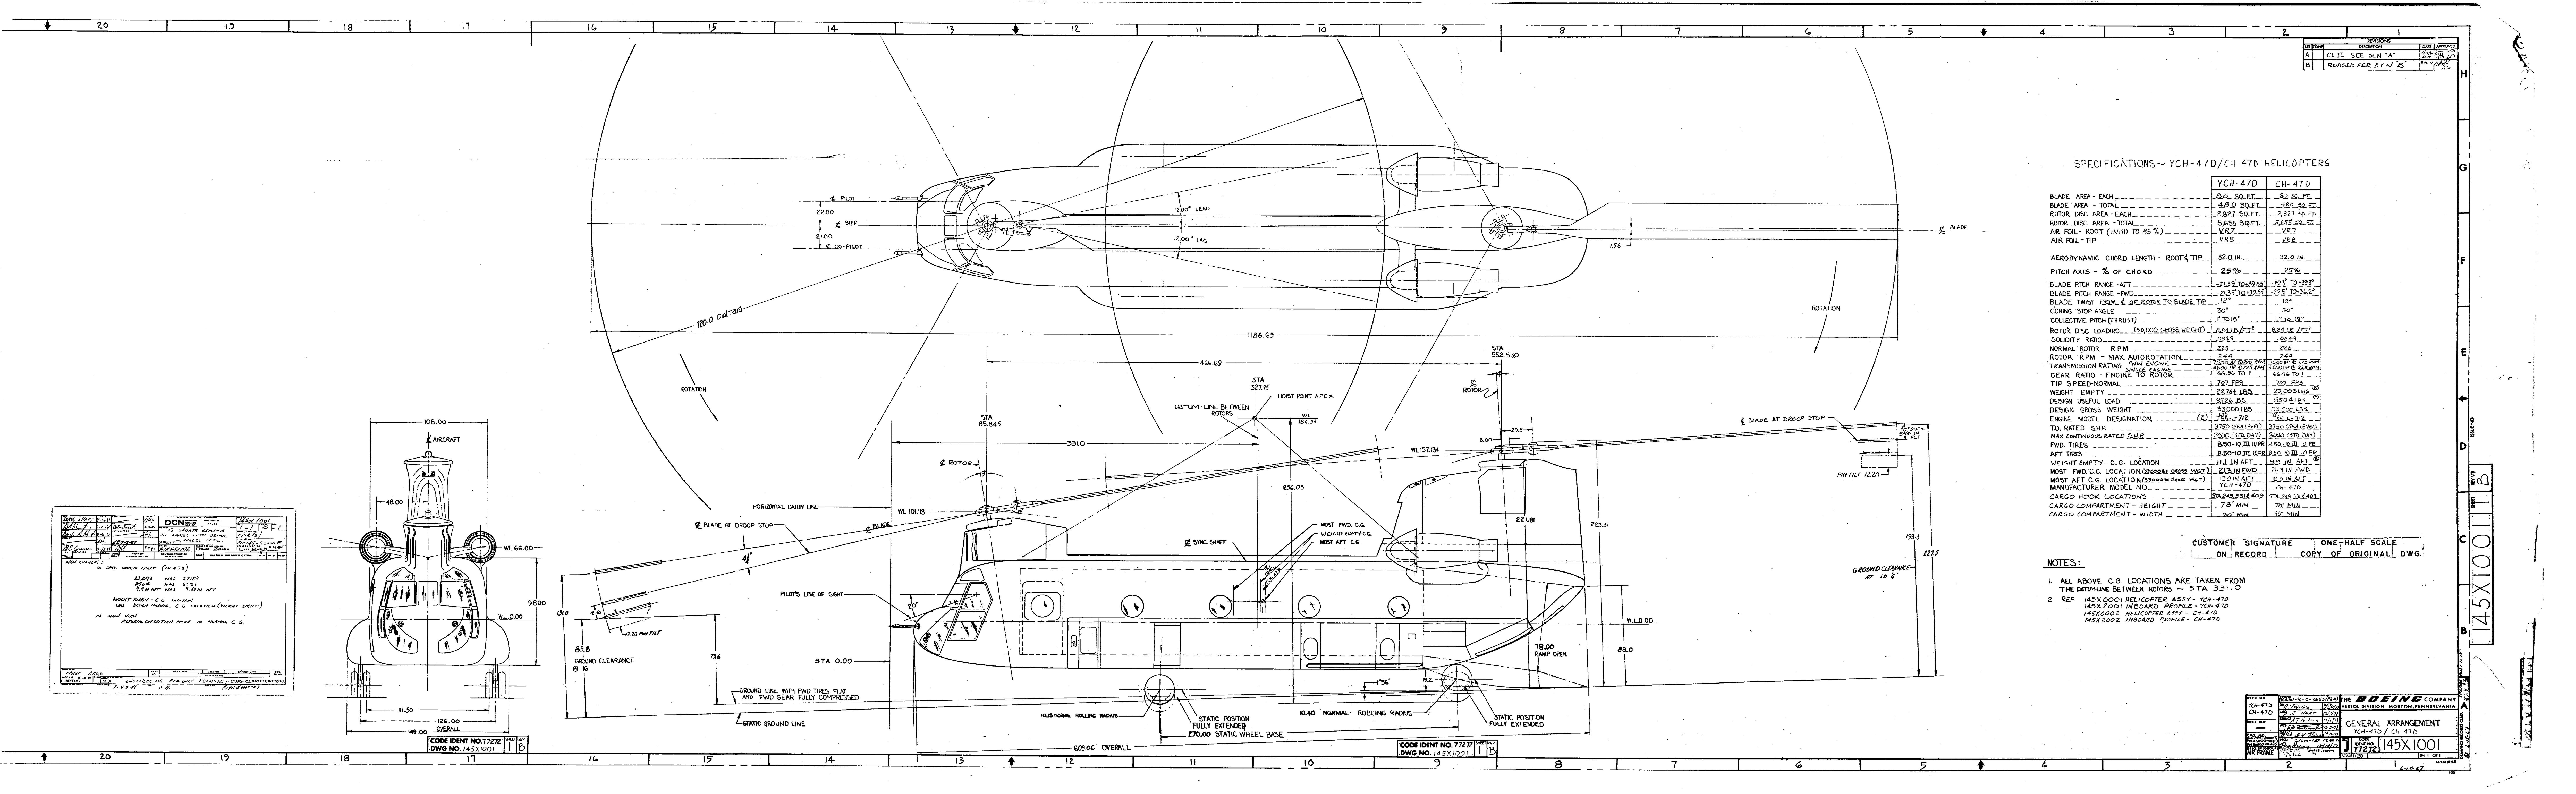 CH-47 Chinook blueprint